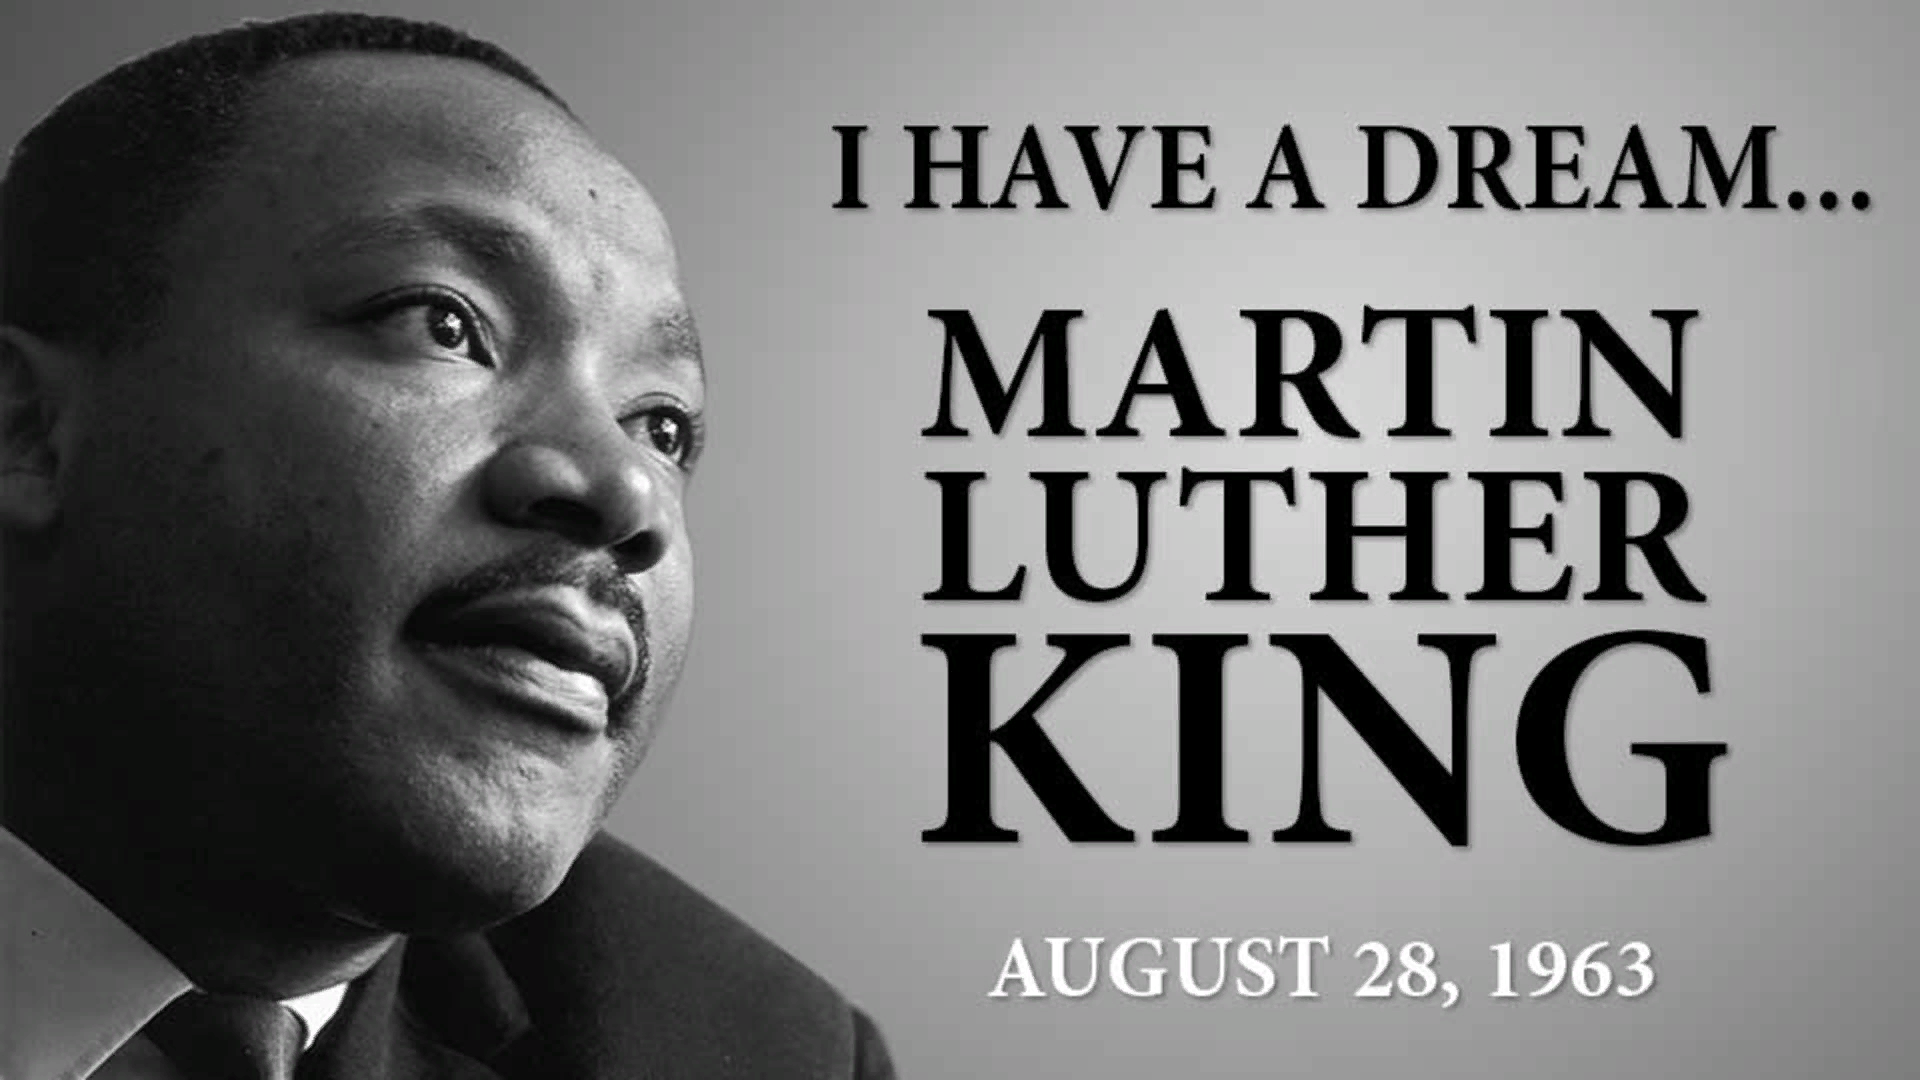 Мартин Лютер Кинг « У меня есть мечта» 28 августа 1963 года